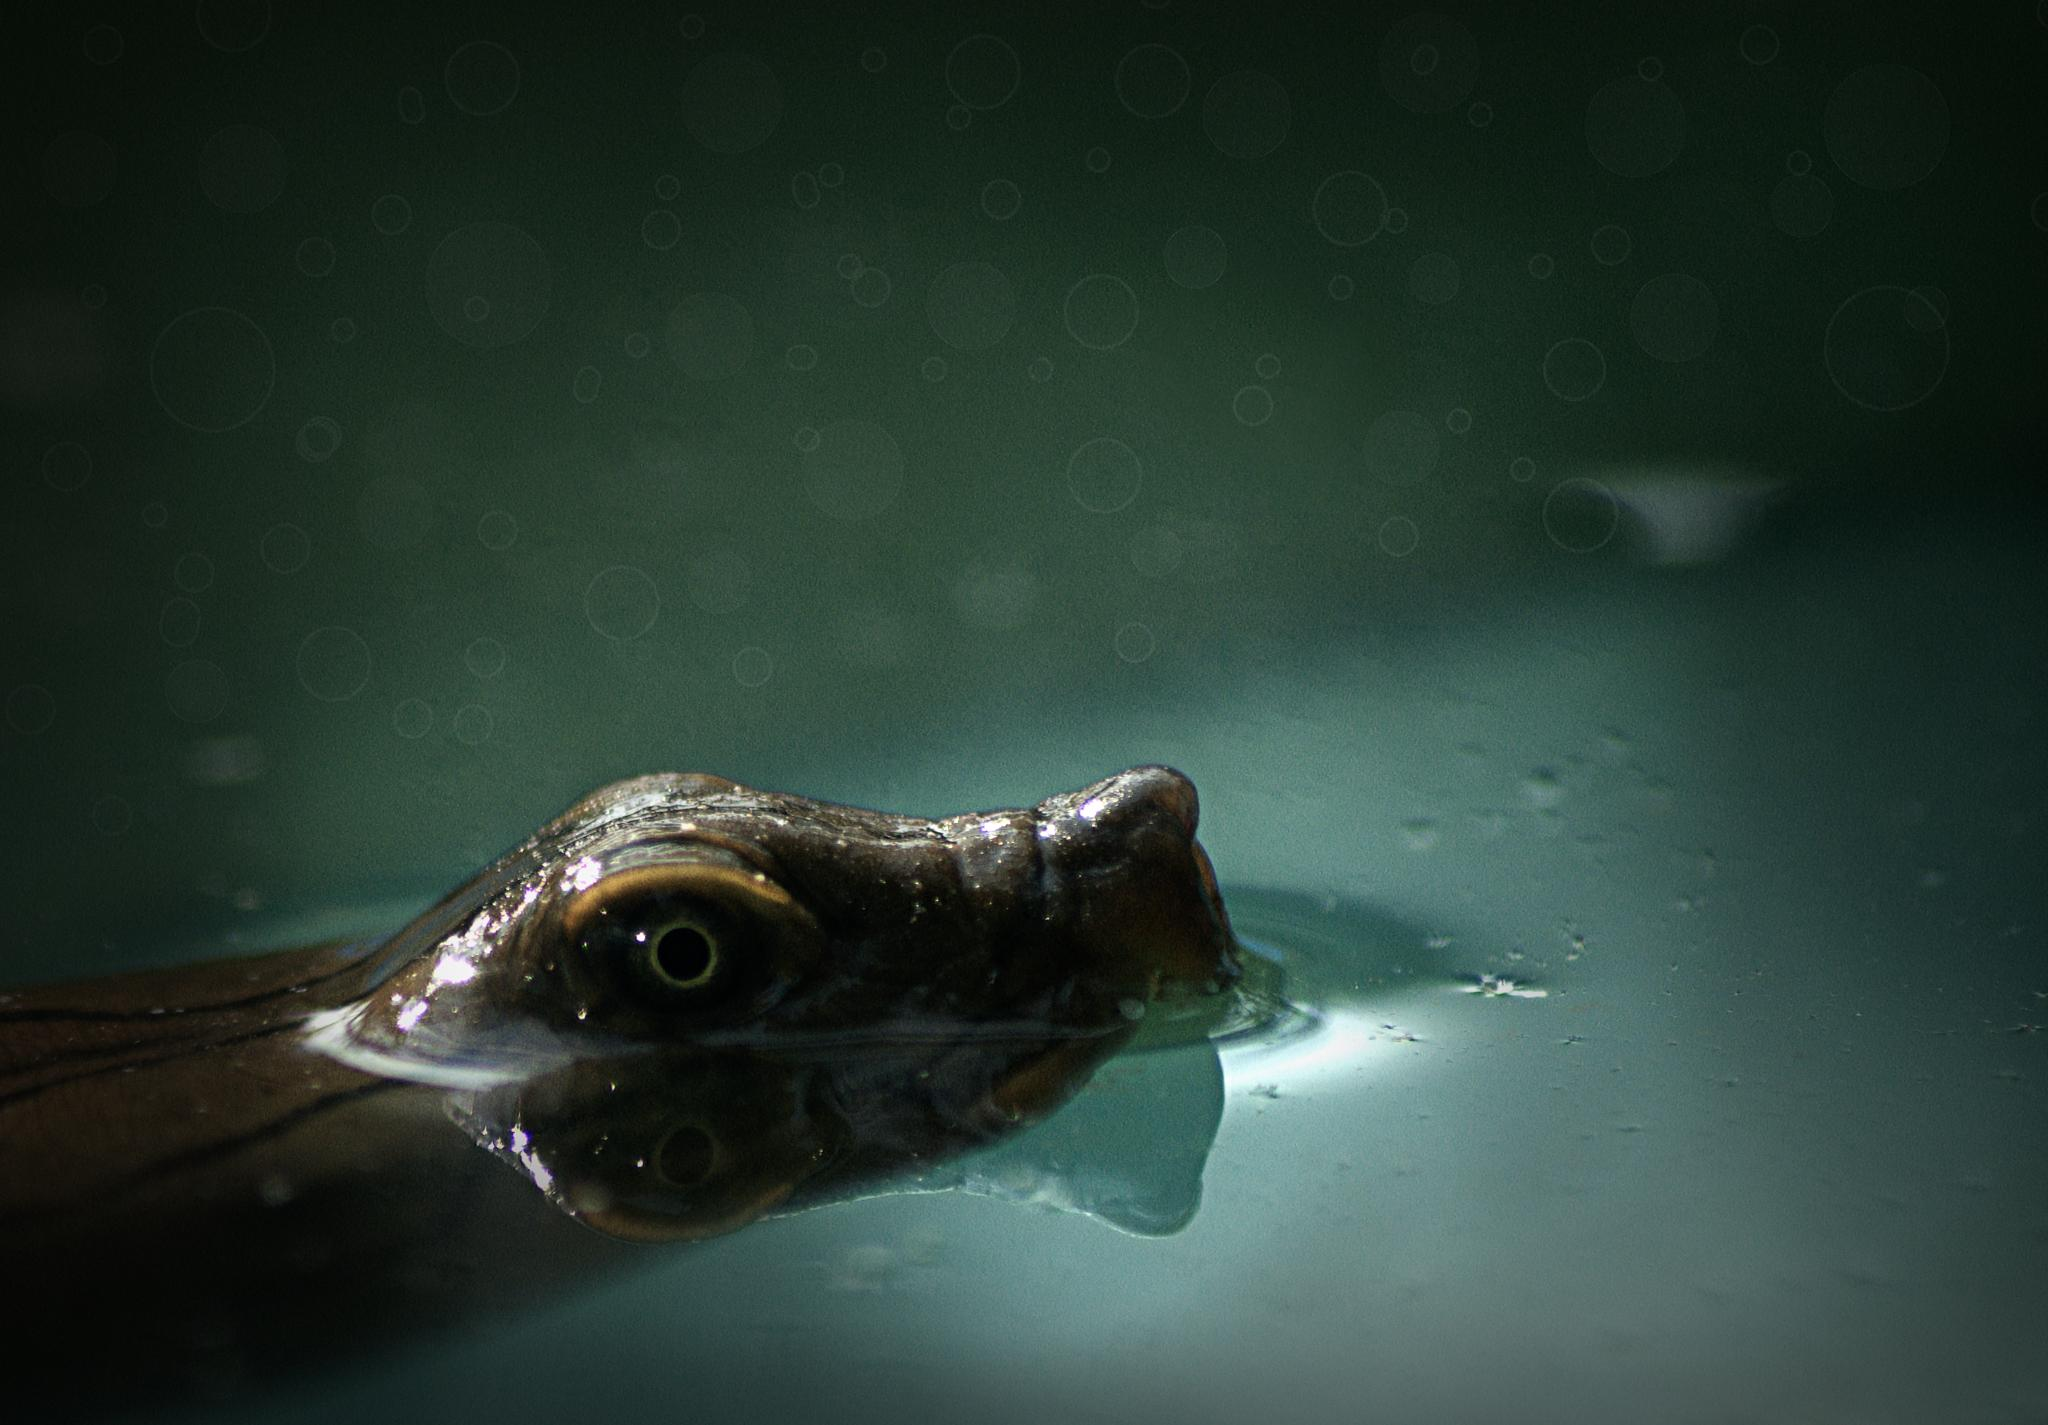 || THE PIG NOSED TORTOISE || by SOUMIN KUMAR SAHA